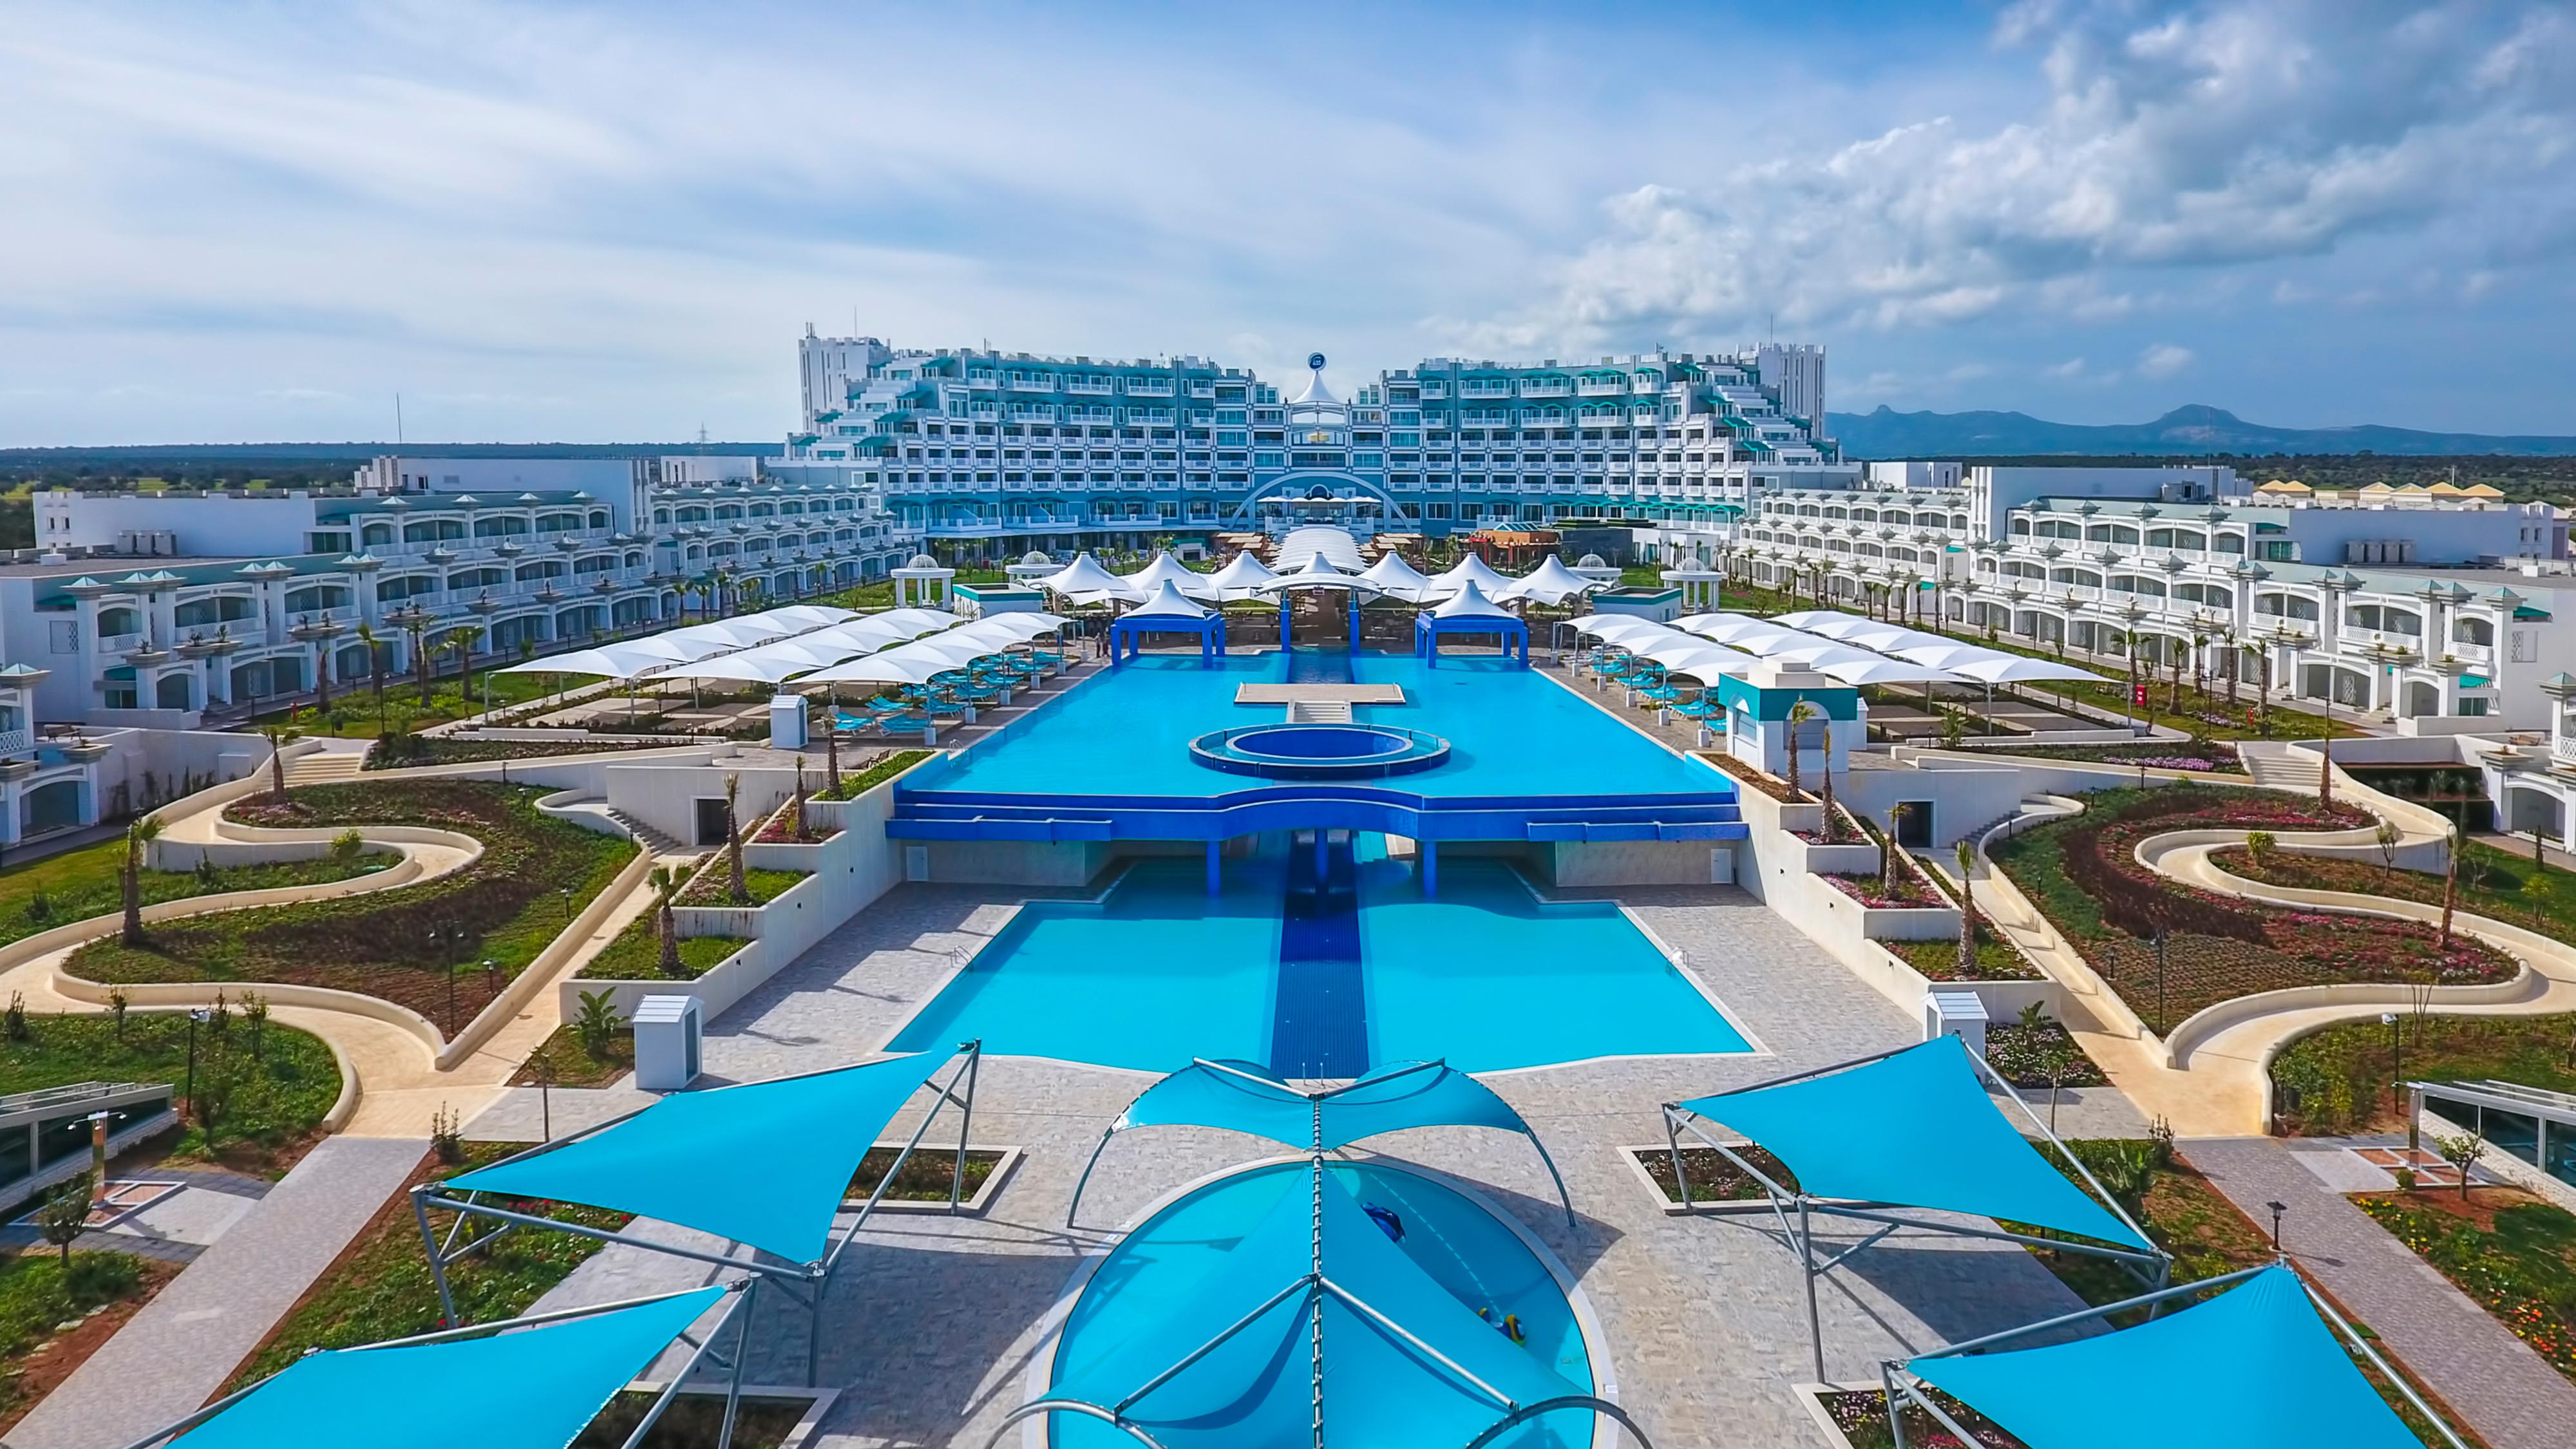 CYPR - ZIMA 2020: Limak Bafra Deluxe Hotel & Resort*****, 8 dni (10-17.02.2020 r.), ultra all inclusive: 2049,00 PLN/os. dorosła